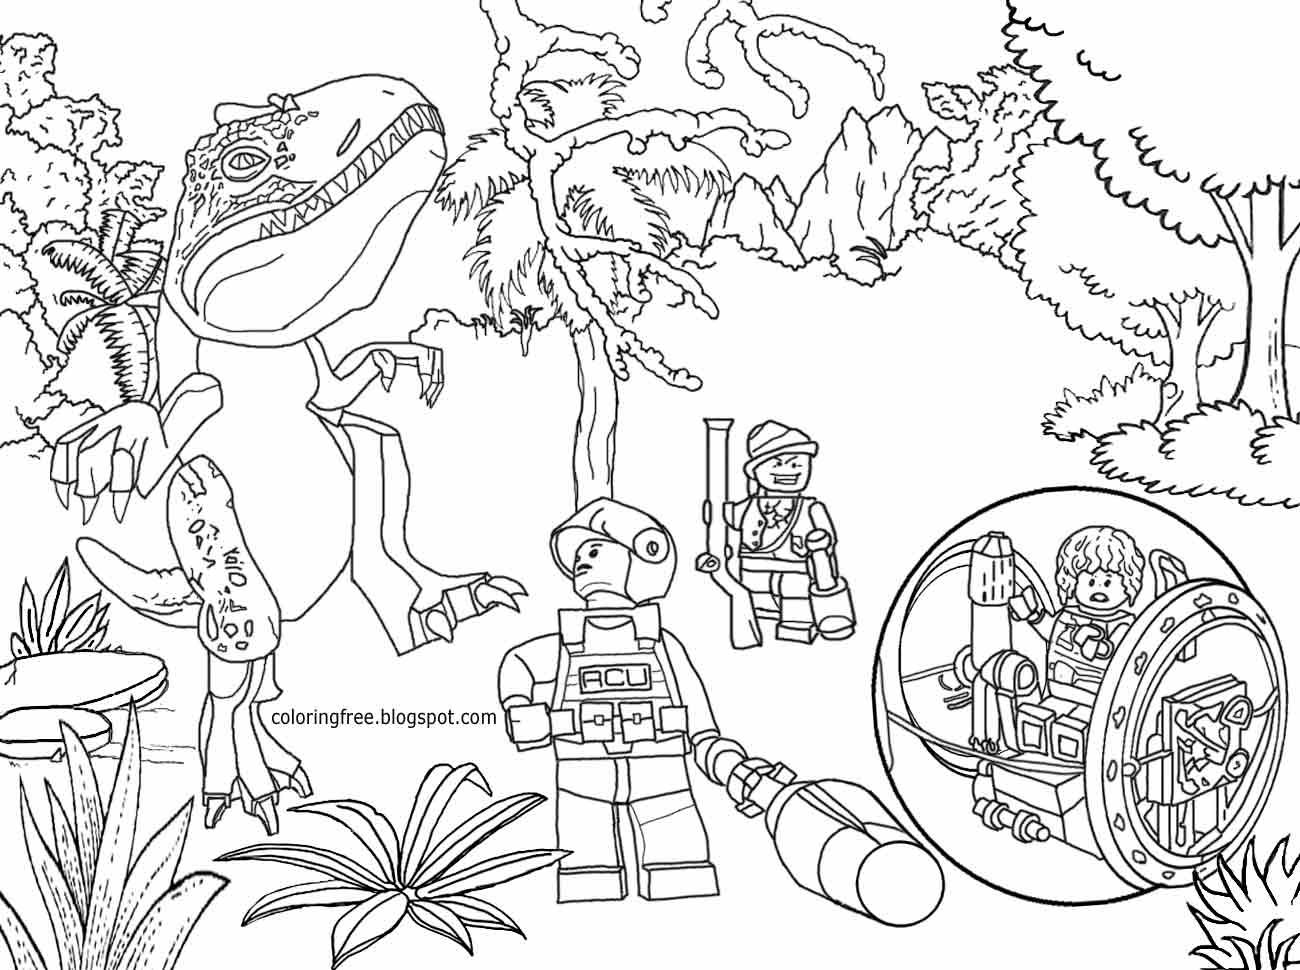 lets coloring book: caveman